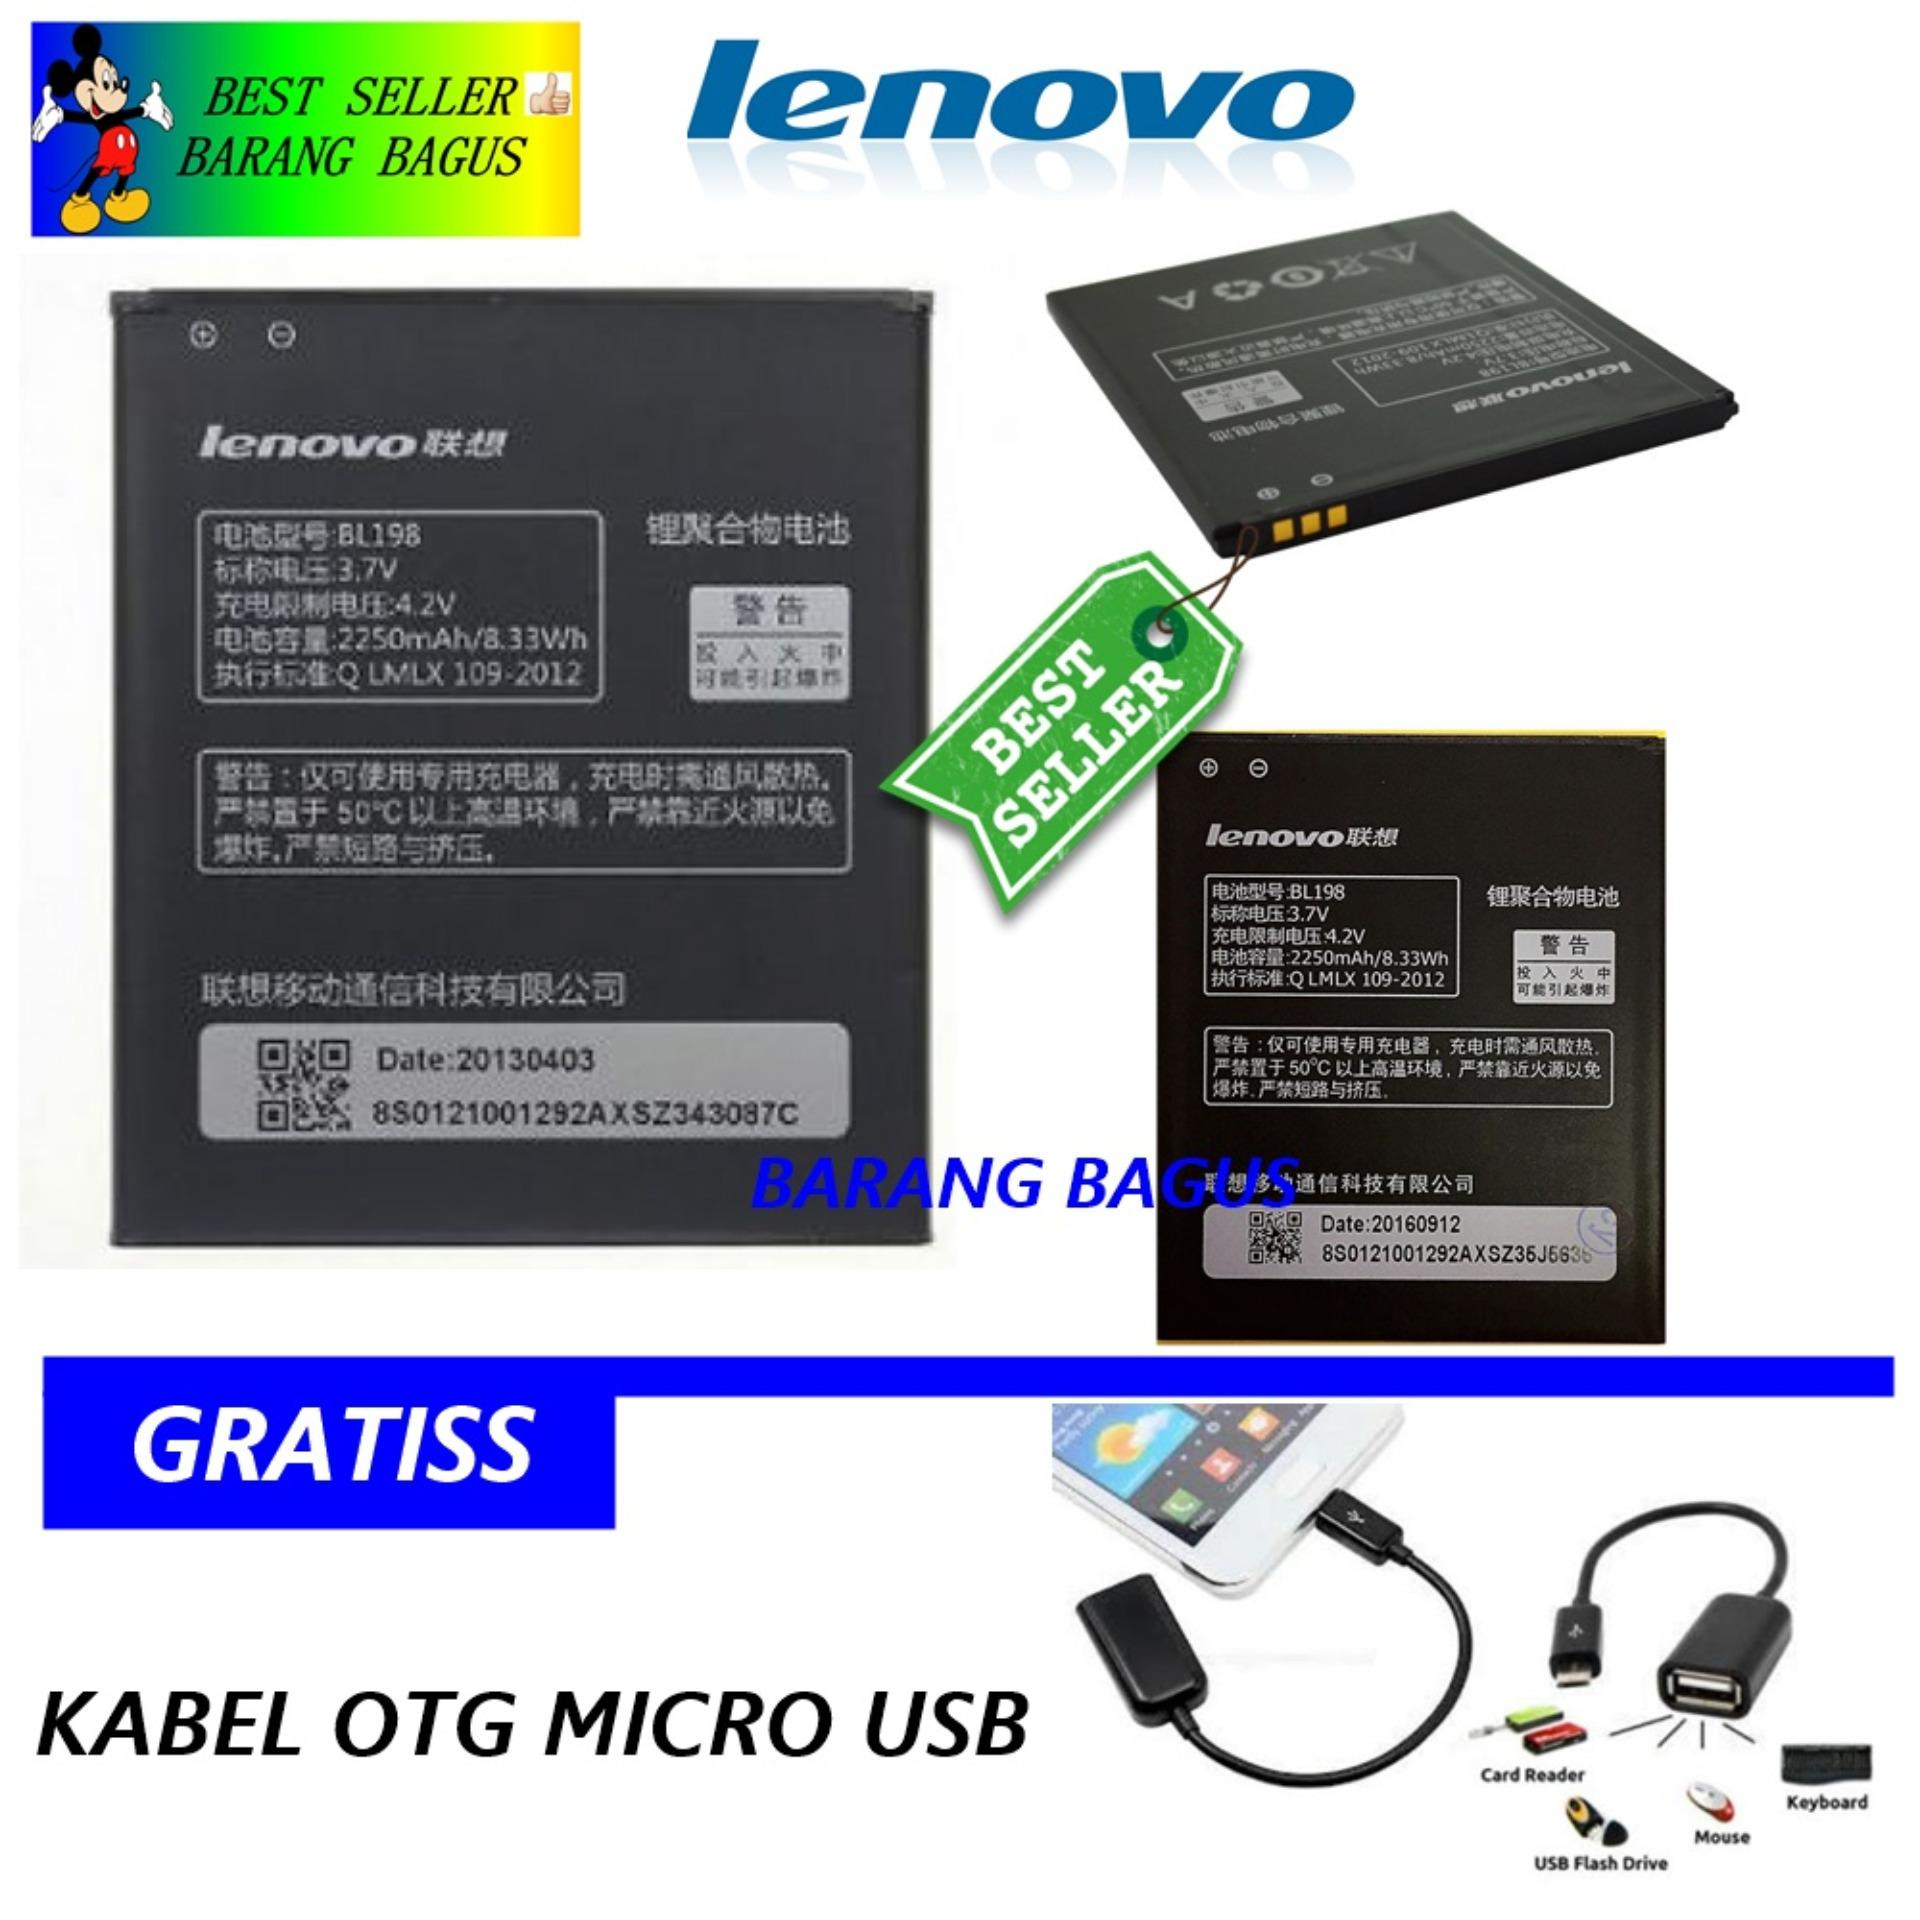 Toko Jual Lenovo Baterai Battery Bl198 Original For Lenovo S880 S920 S890 K860 A850 A859 A800 Kapasitas 2250Mah Bonus Kabel Otg Micro Usb